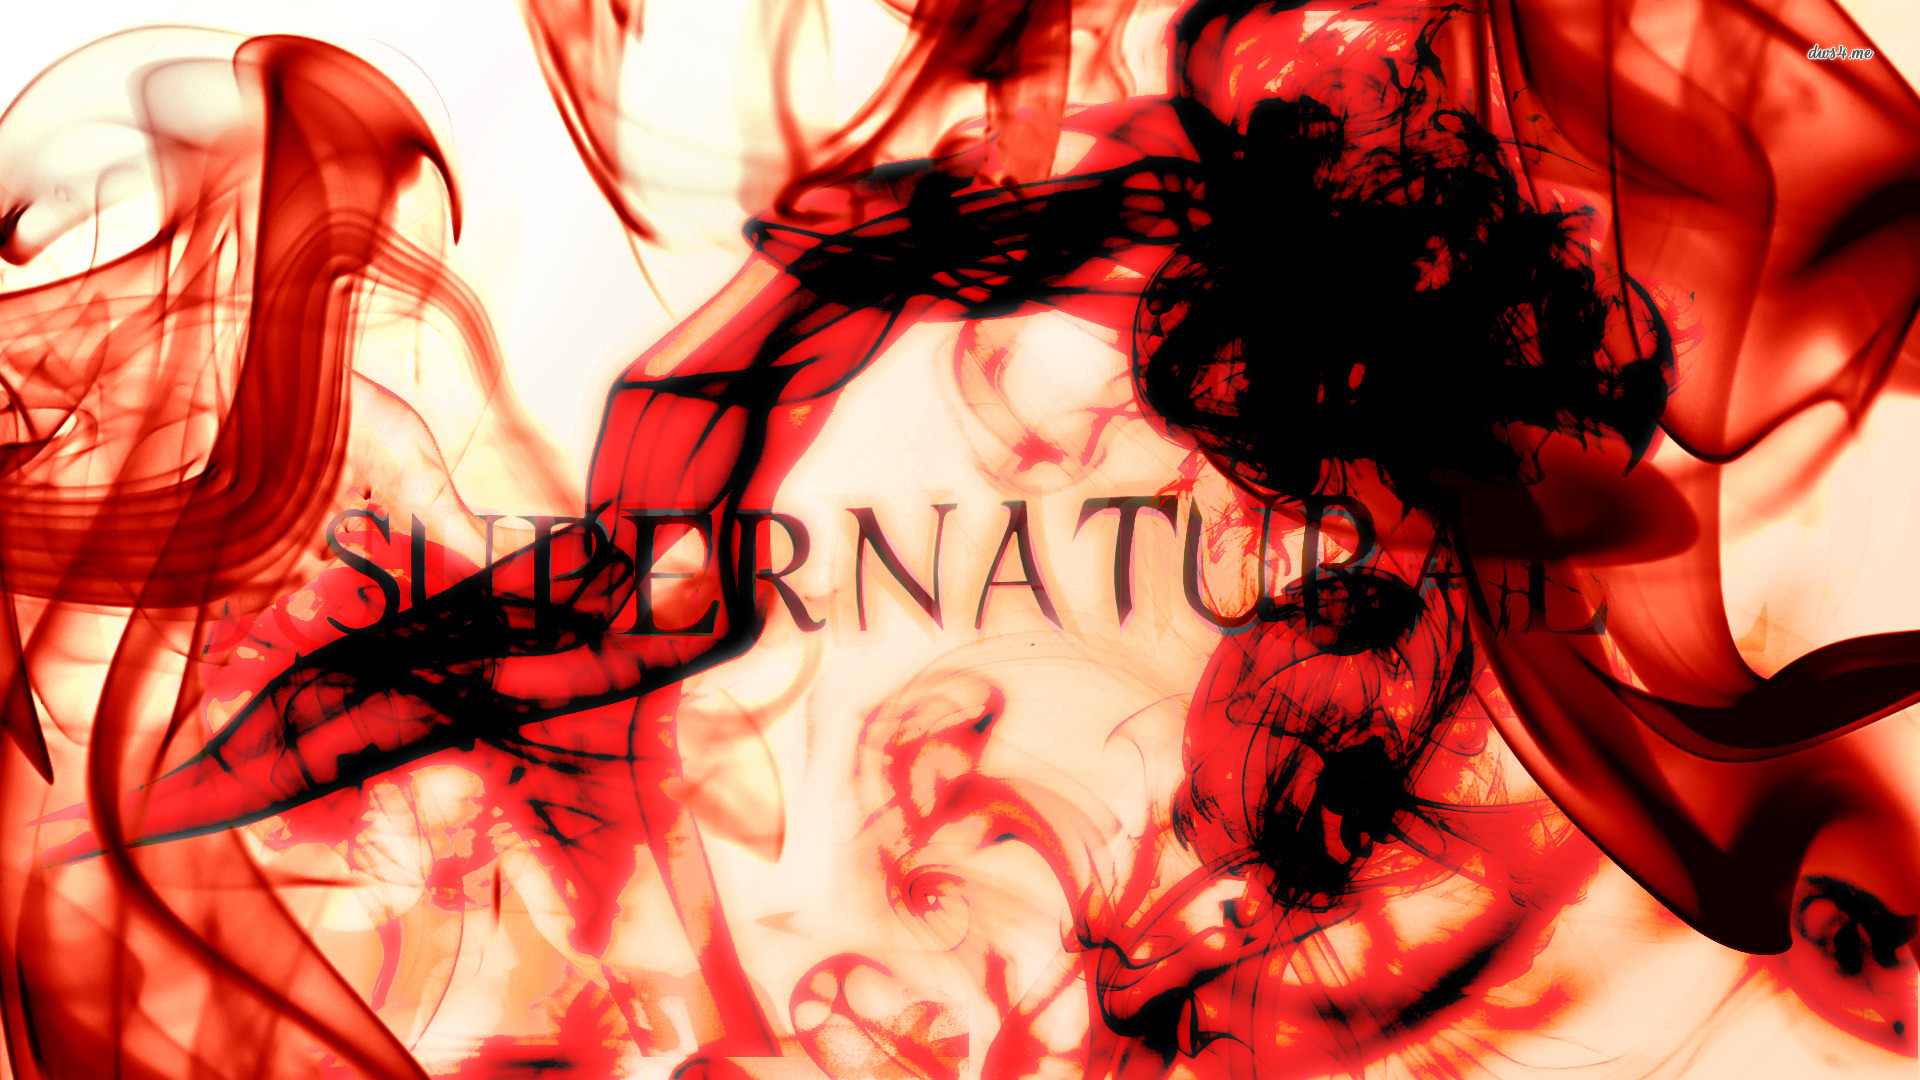 hd supernatural desktop wallpapers 1920x1080 sam and dean 1920x1080